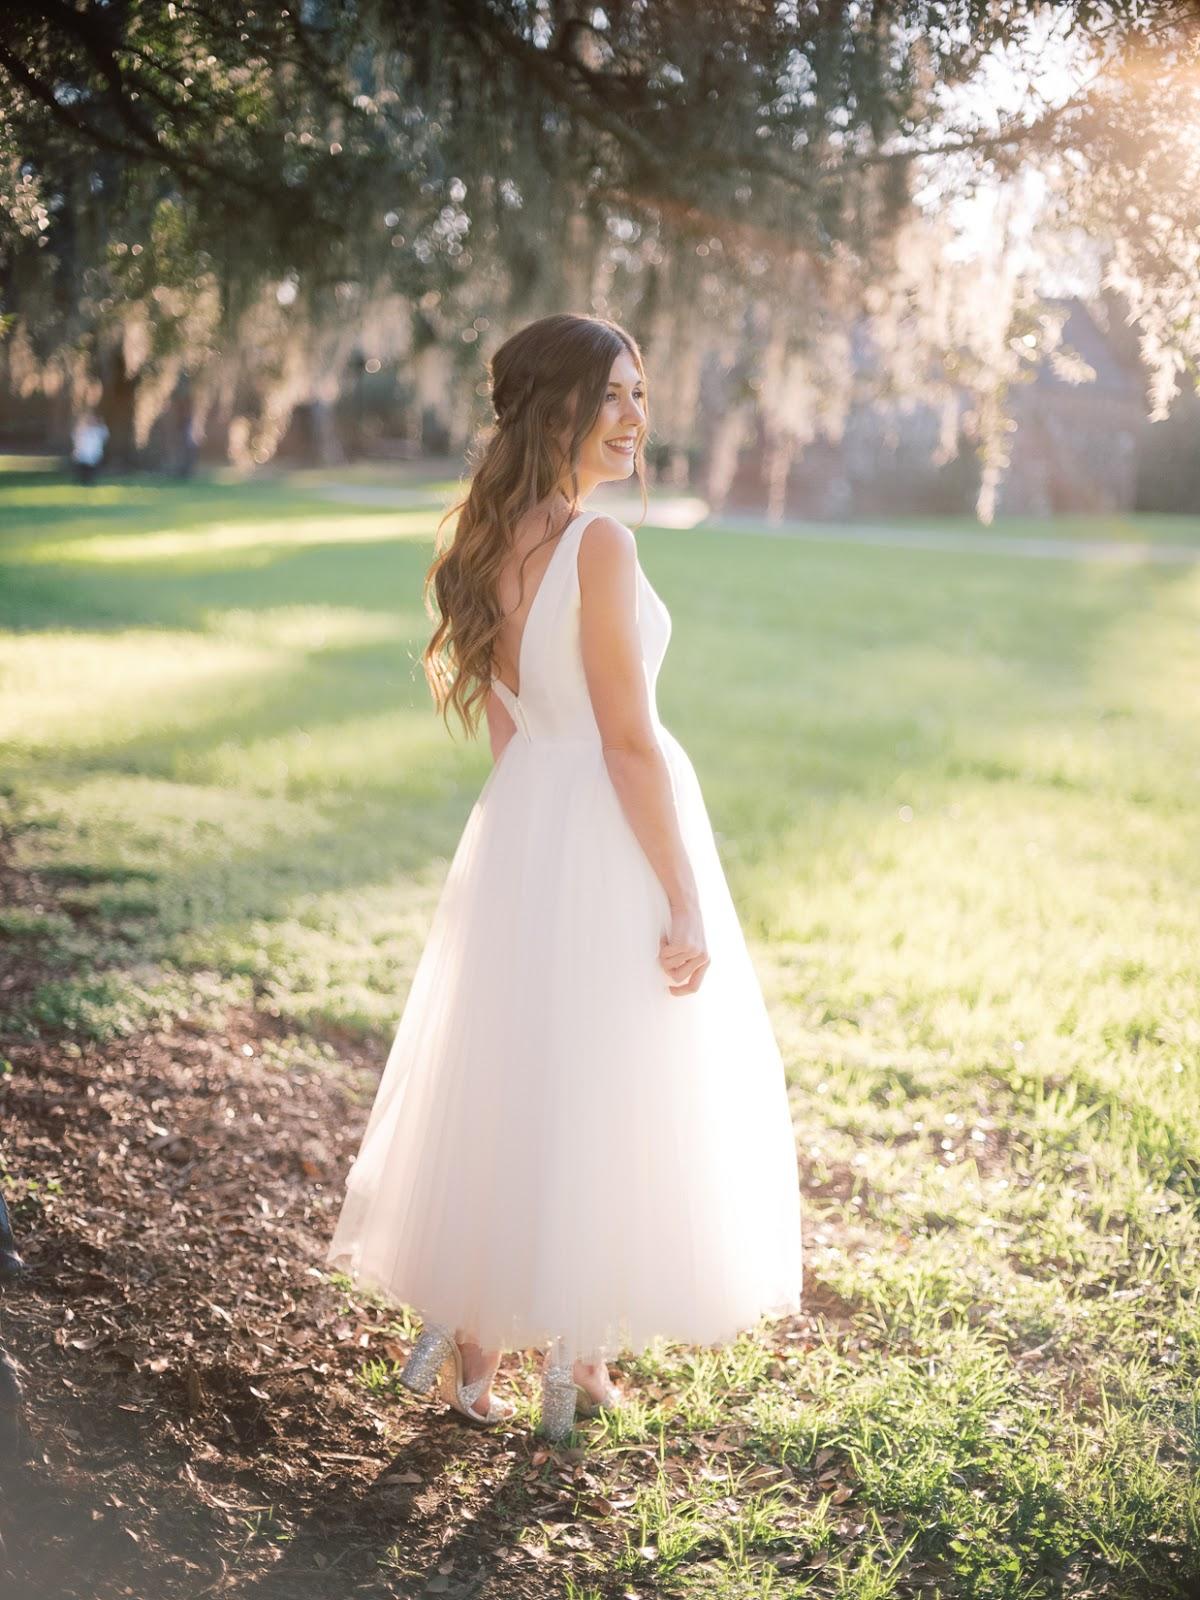 Reception Dress at Boone Hall Plantation - Chasing Cinderella